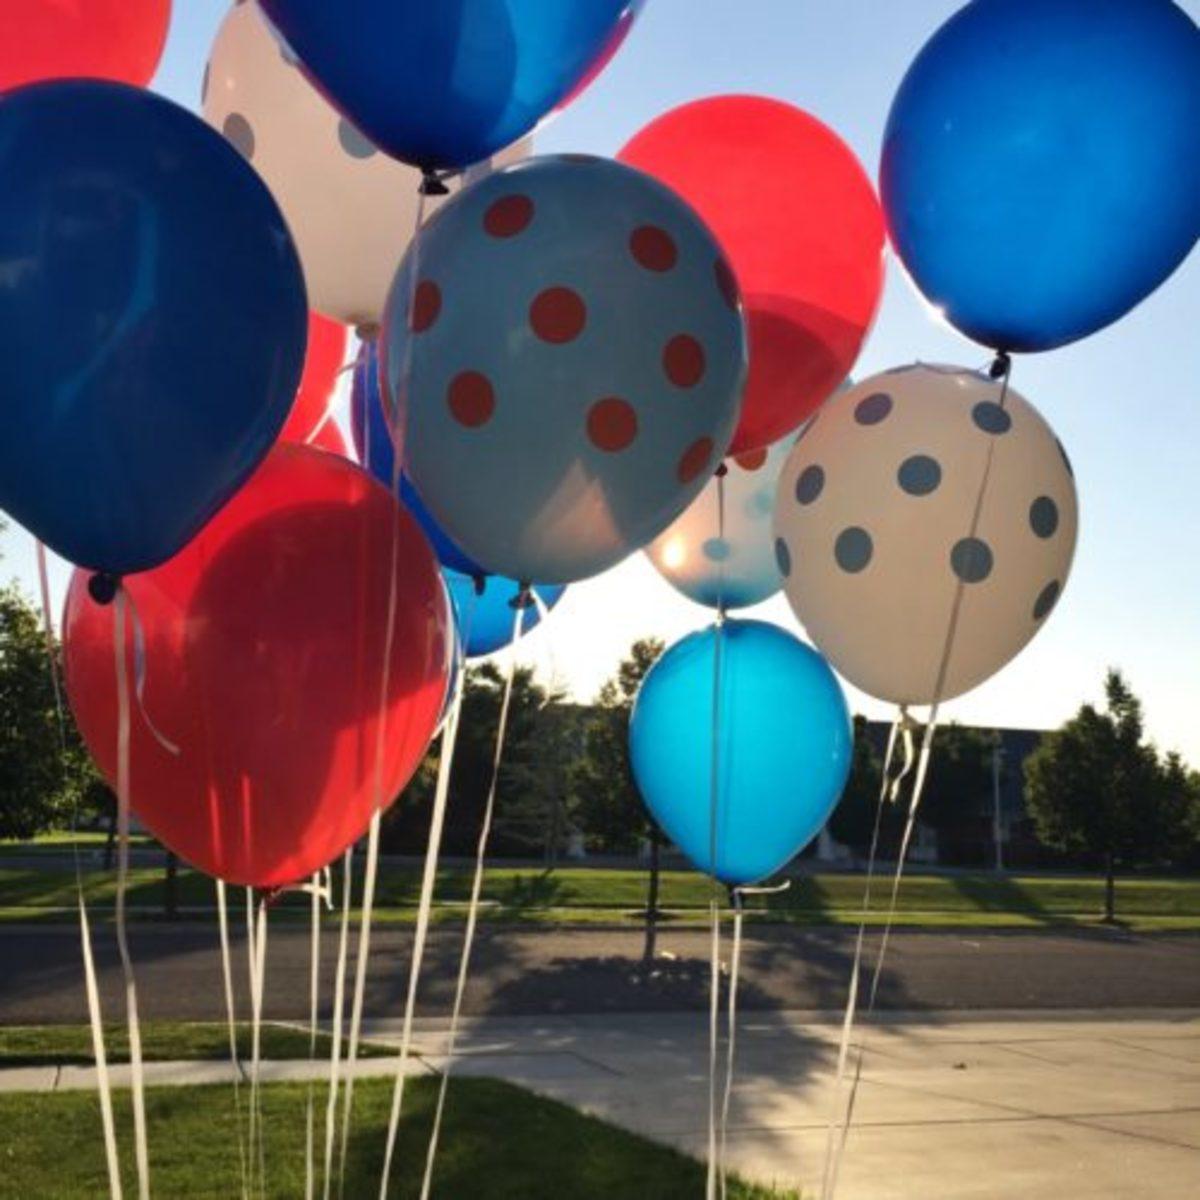 4th of July Balloon Doorbell Surprise